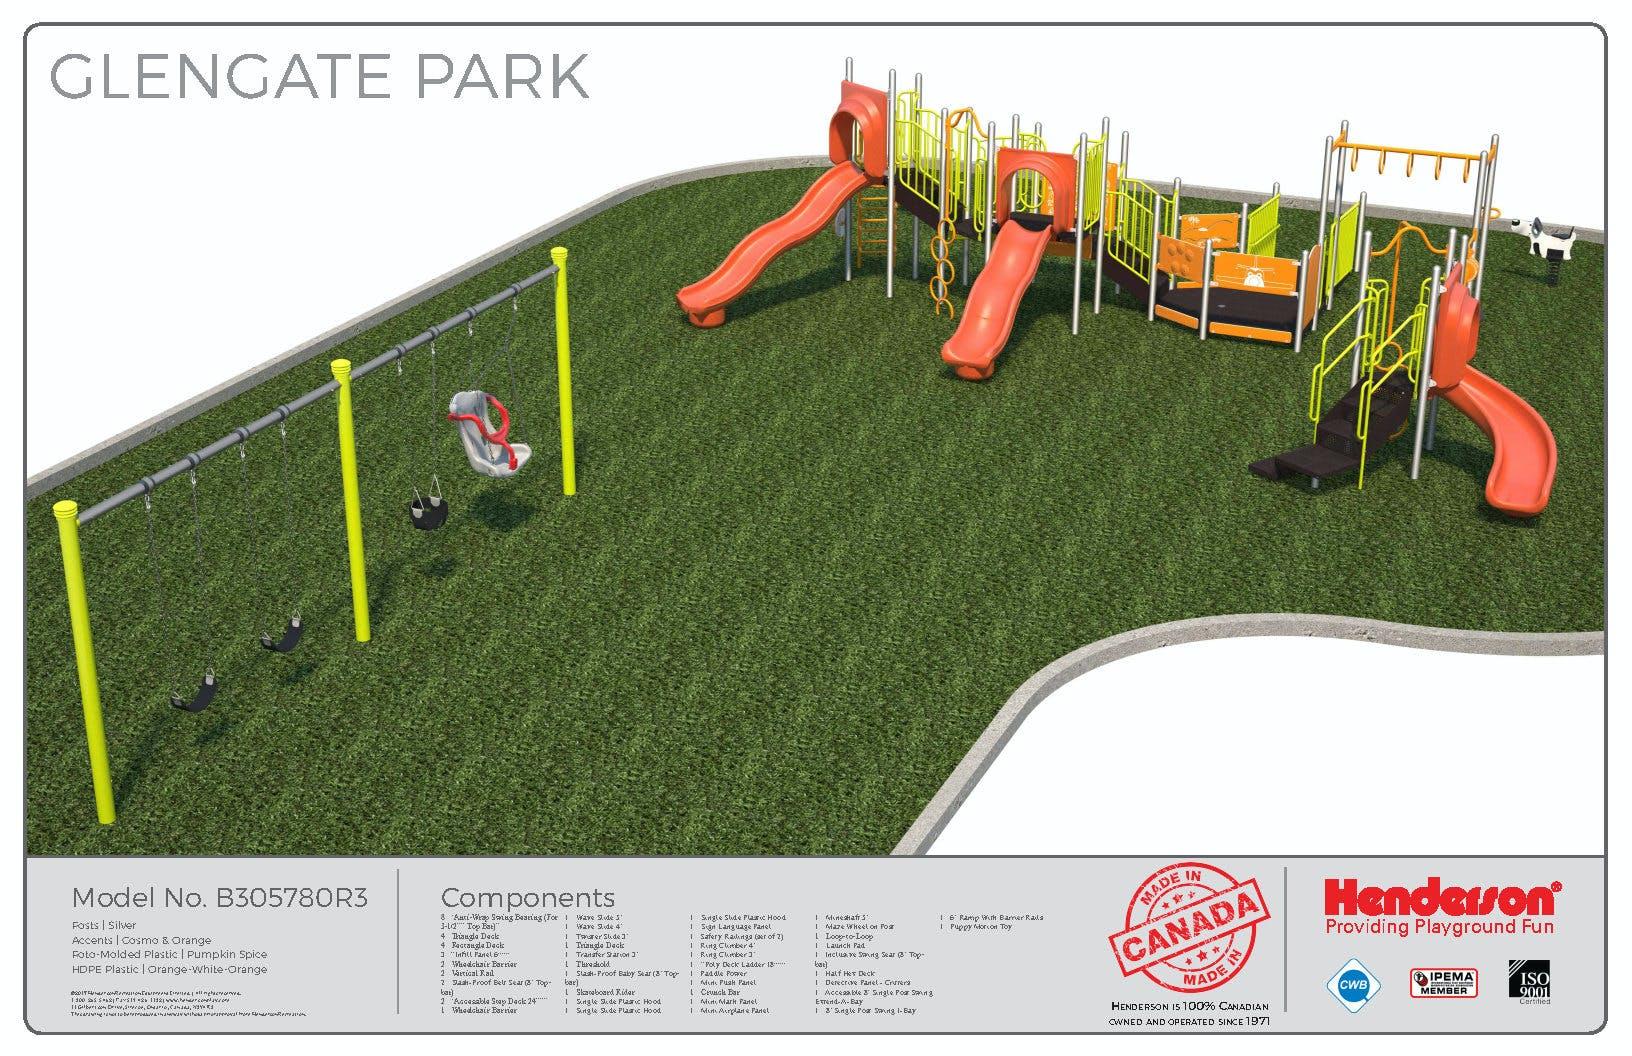 Glengate Park Rendering